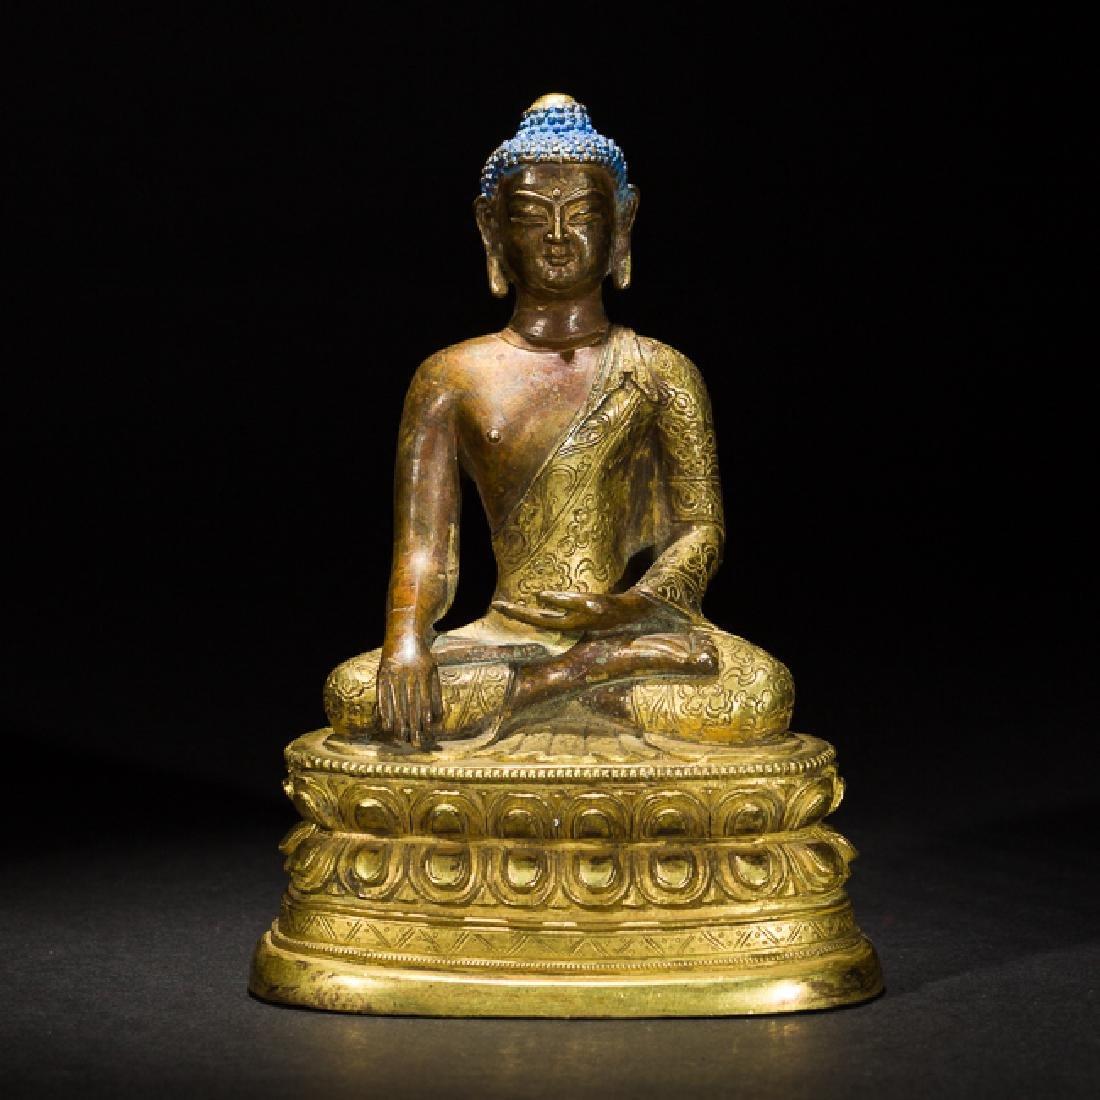 Antique Gilt Bronze Figure of Shakyamuni Buddha, 18th